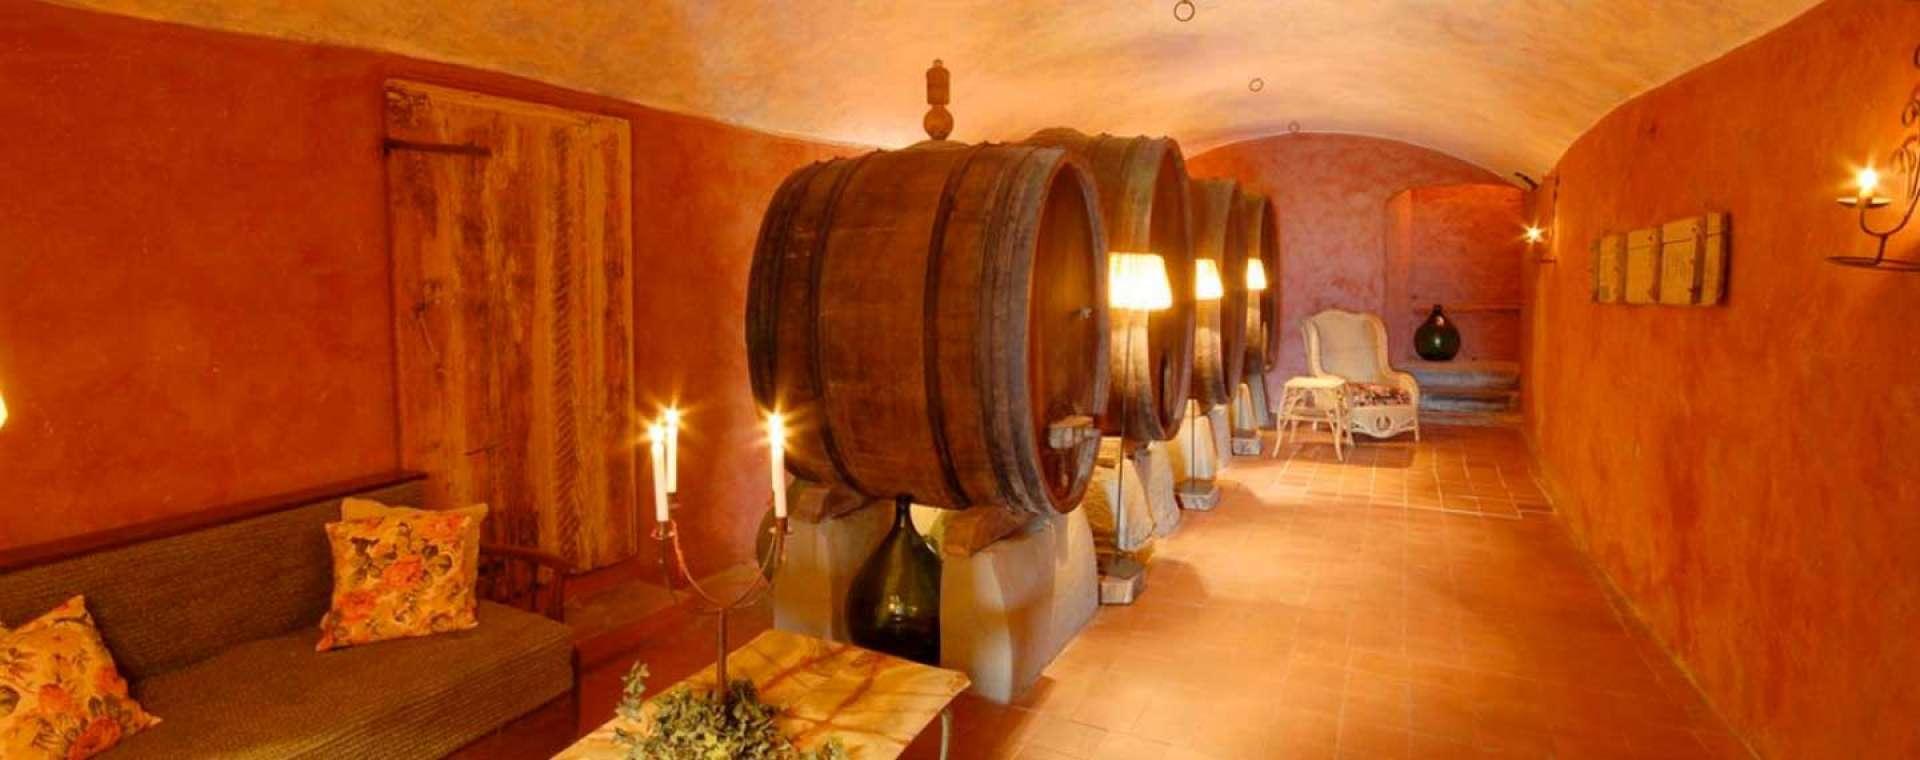 The History of Chianti Wine